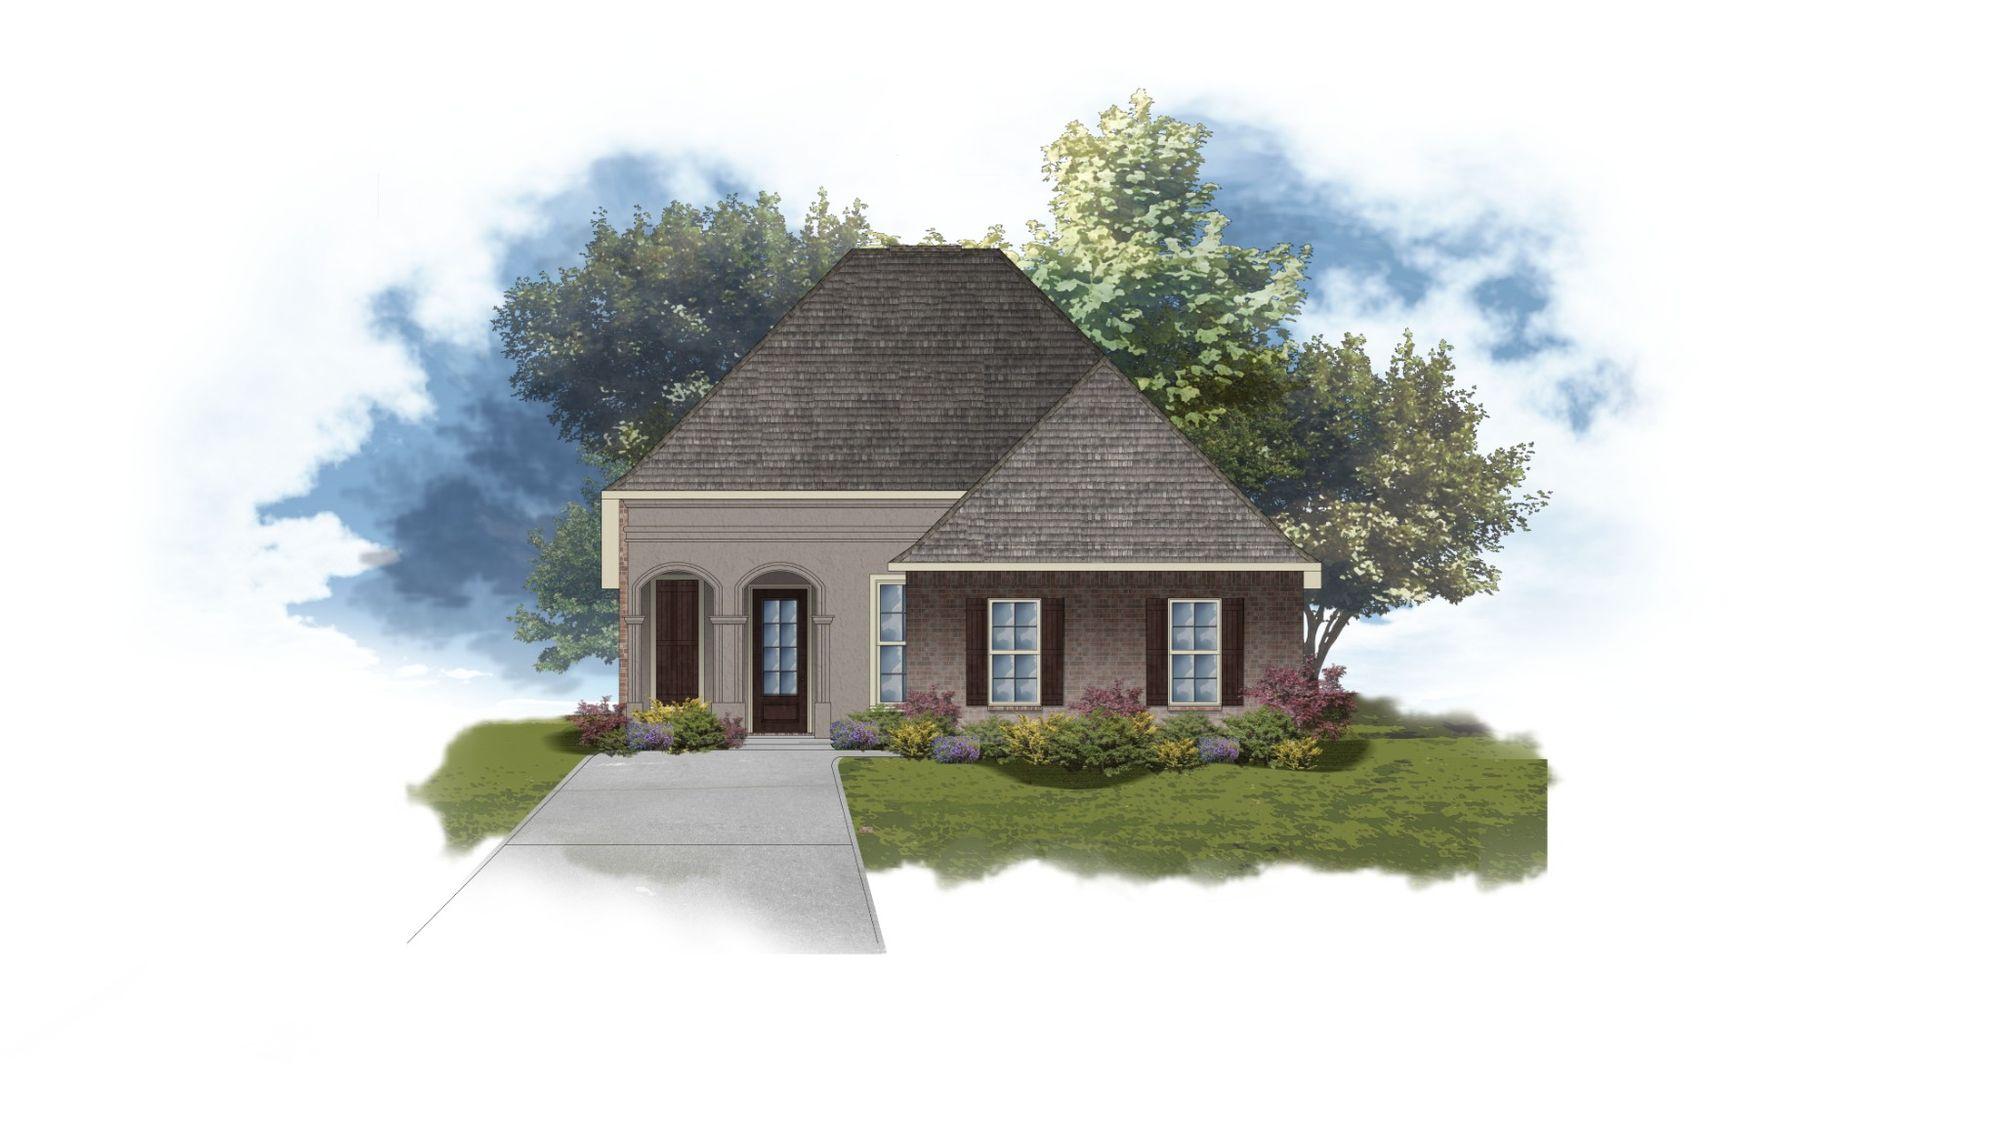 DSLD Homes - Ricci II A Open Floorplan Elevation Image